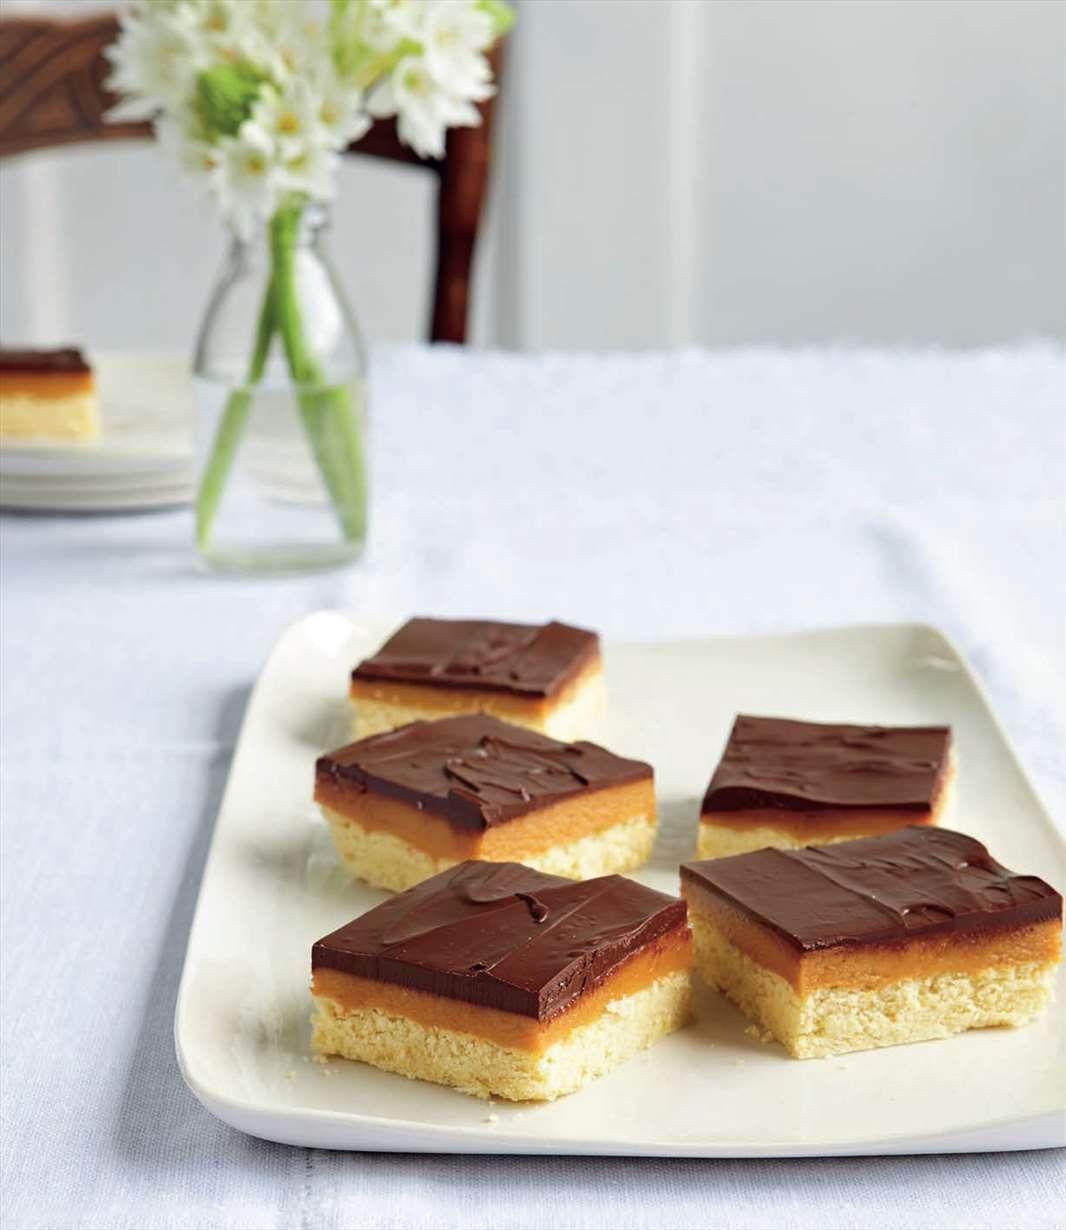 Chocolate Caramel Slice Recipe From Baking By Margaret Fulton Cooked Baking Slices Recipes Chocolate Caramel Slice